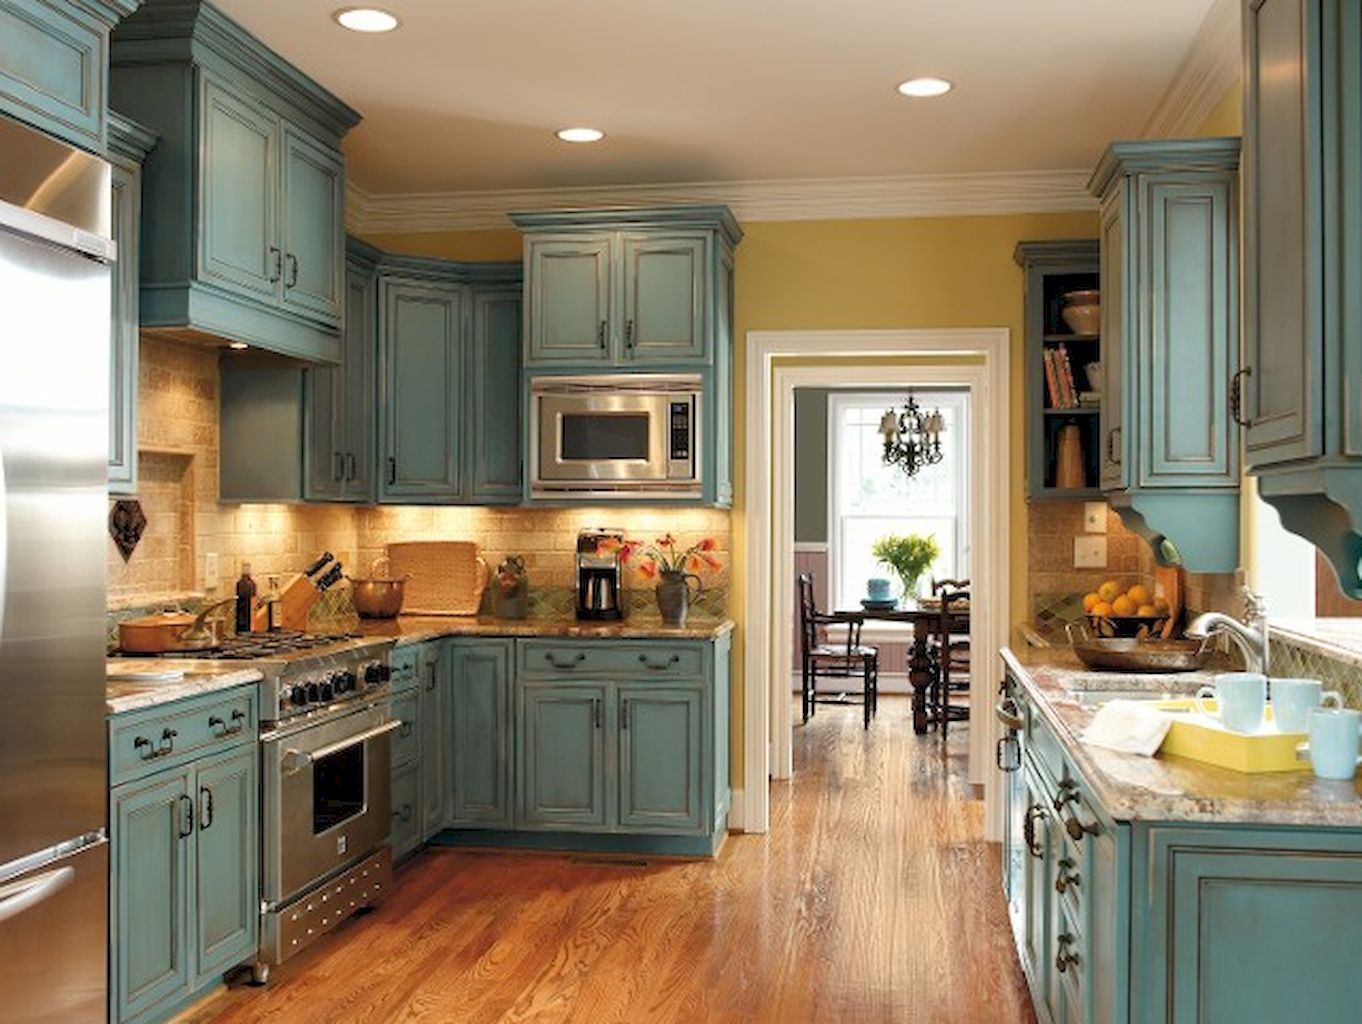 90 rustic kitchen cabinets farmhouse style ideas 5 distressed kitchen distressed kitchen on kitchen cabinets rustic farmhouse style id=66135